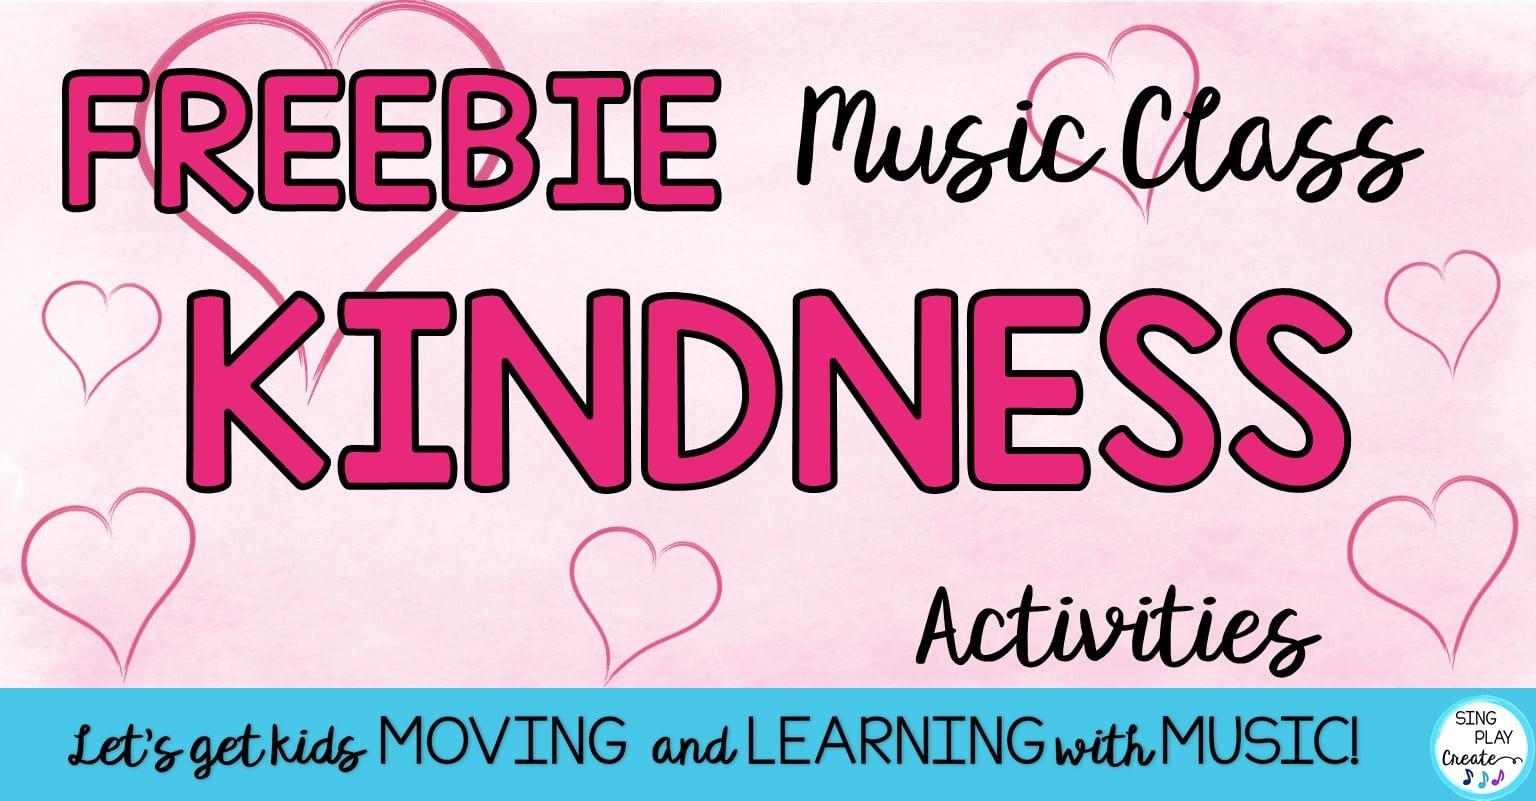 Free Kindness Music Class Activities